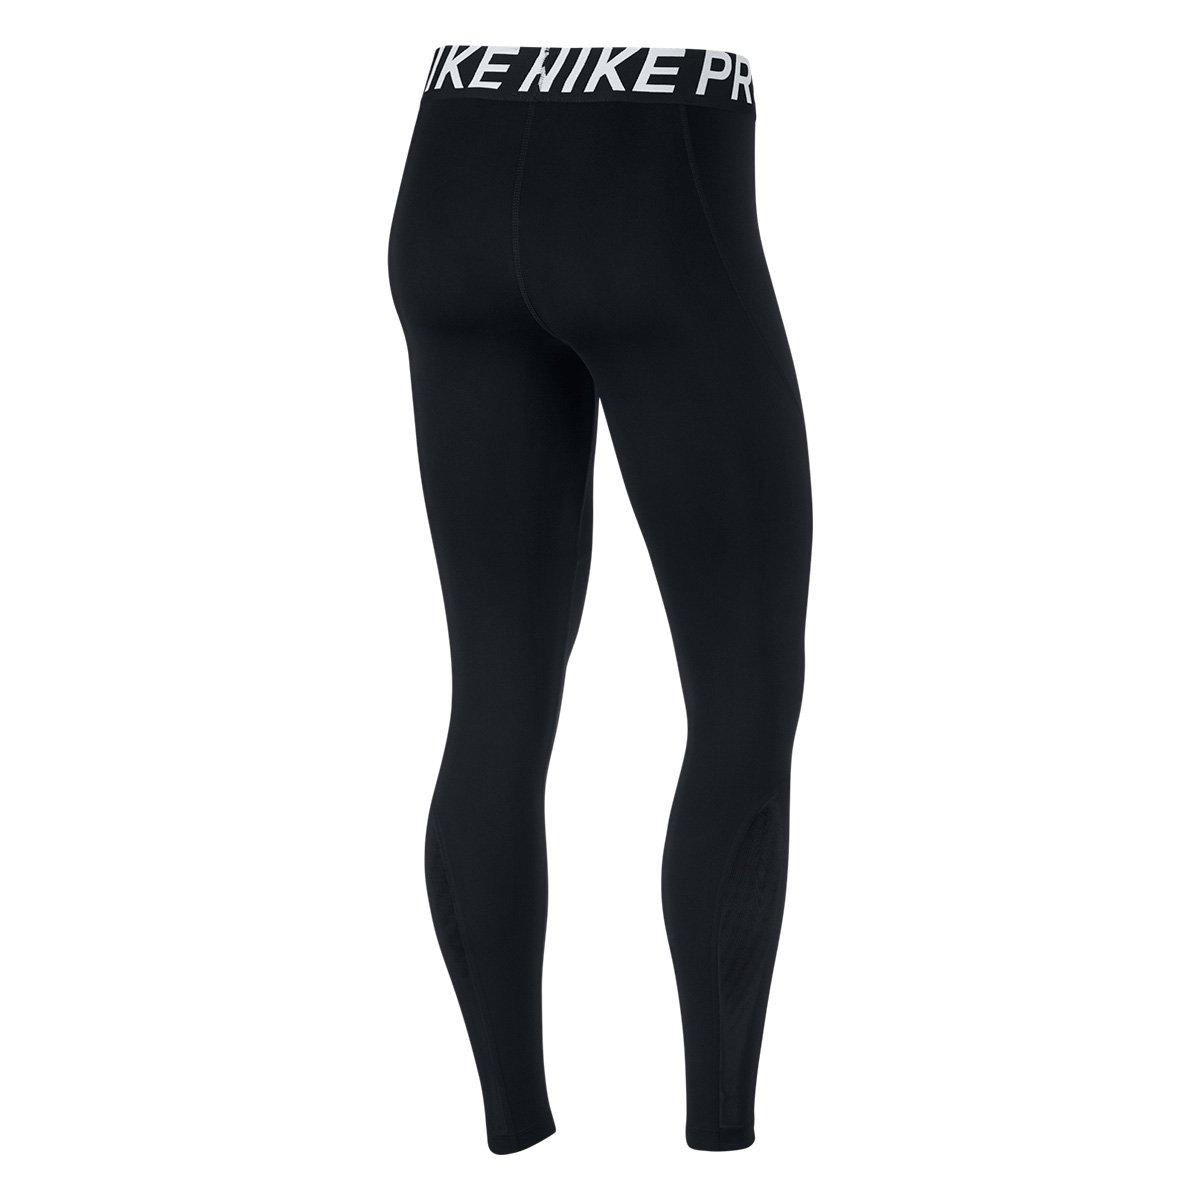 Calça Legging Nike Tight Feminina - Tam: G - 3